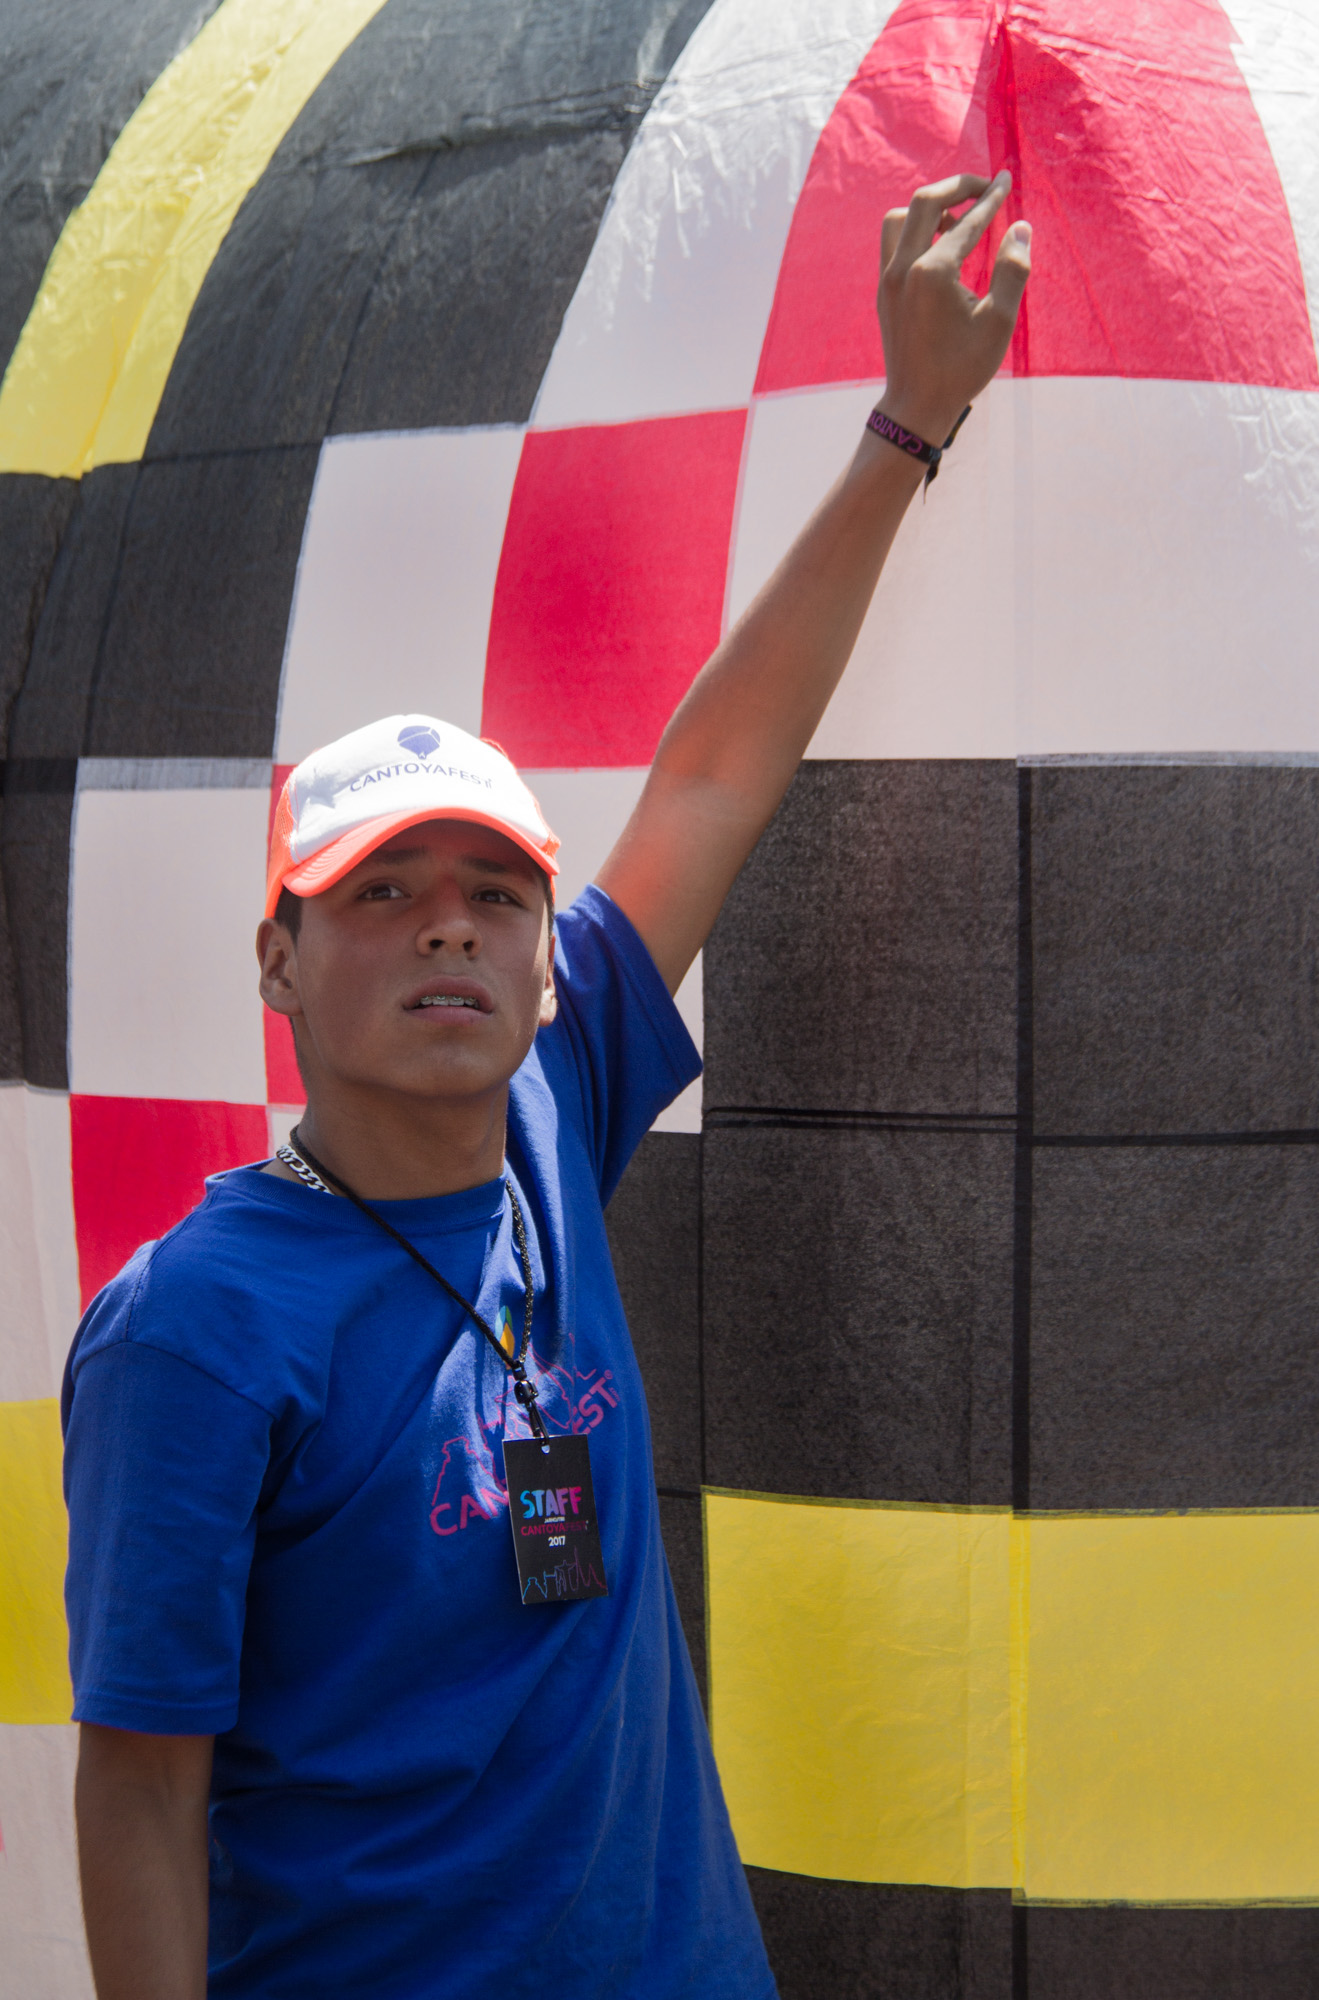 Check. Mate.   CantoyaFest: Pátzcuaro, Michoacán, Mexico — Saturday, July 22, 2017